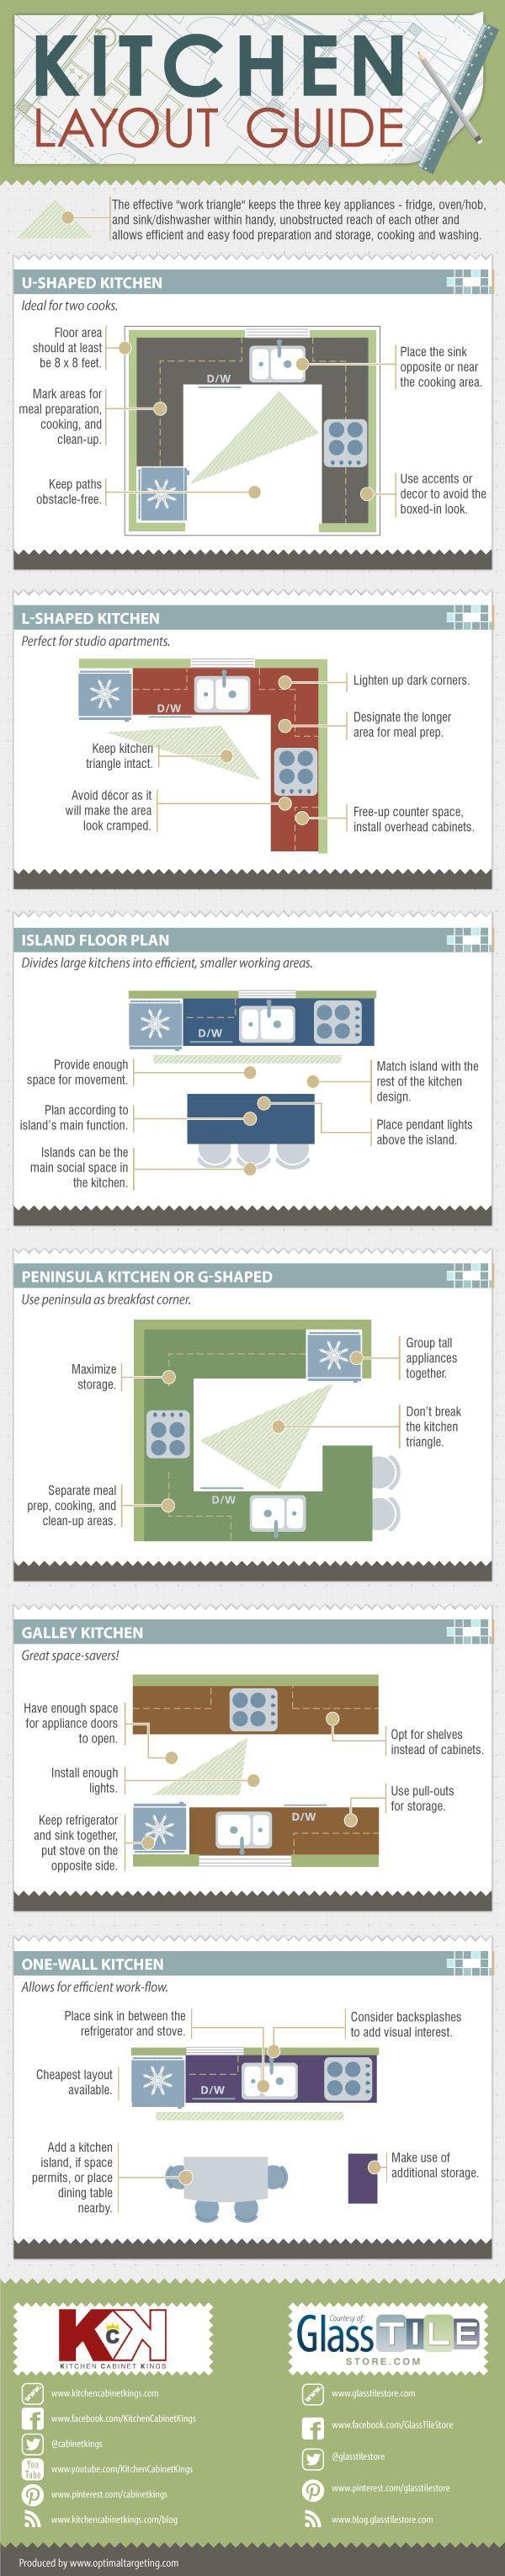 49 best Kitchen Remodel images on Pinterest | Kitchens, Kitchen ...